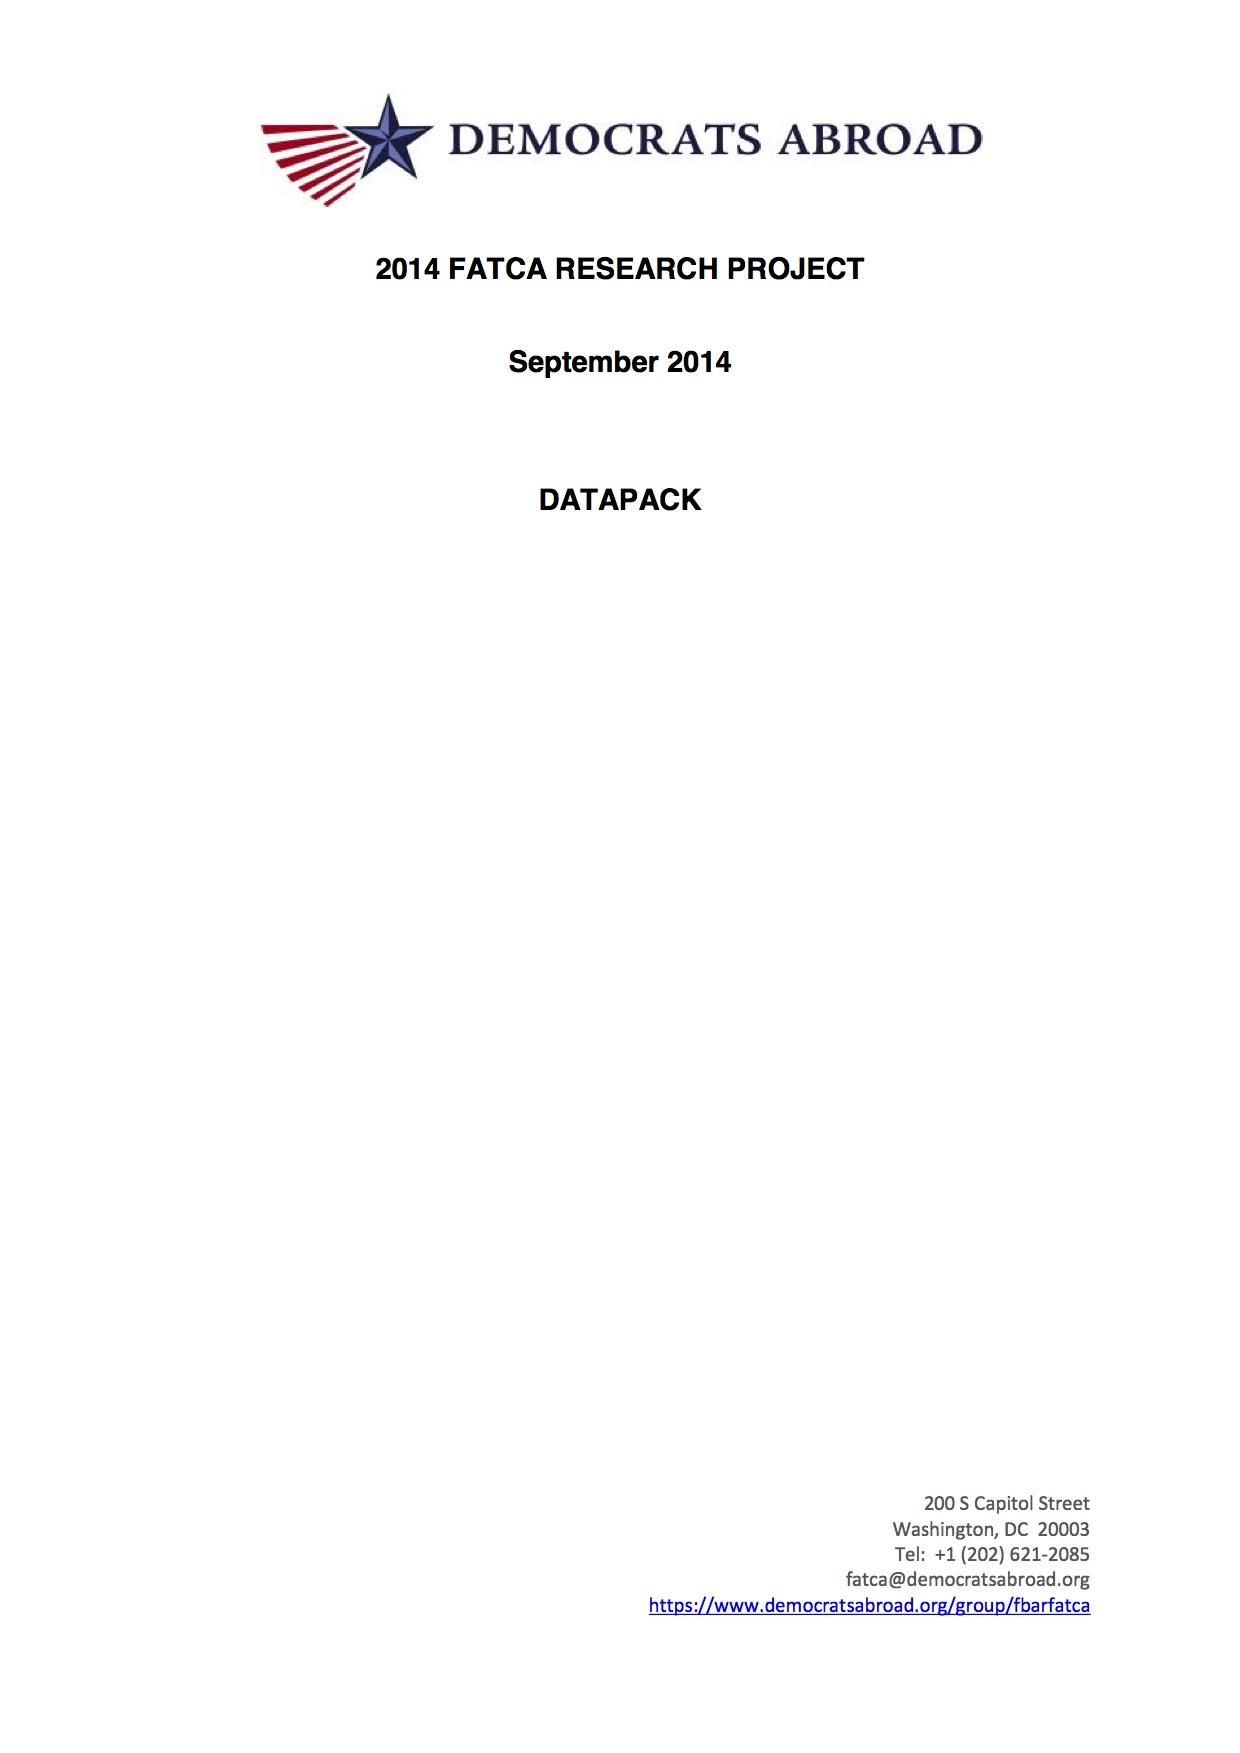 Democrats_Abroad_2014_FATCA_Research_Datapack.jpg